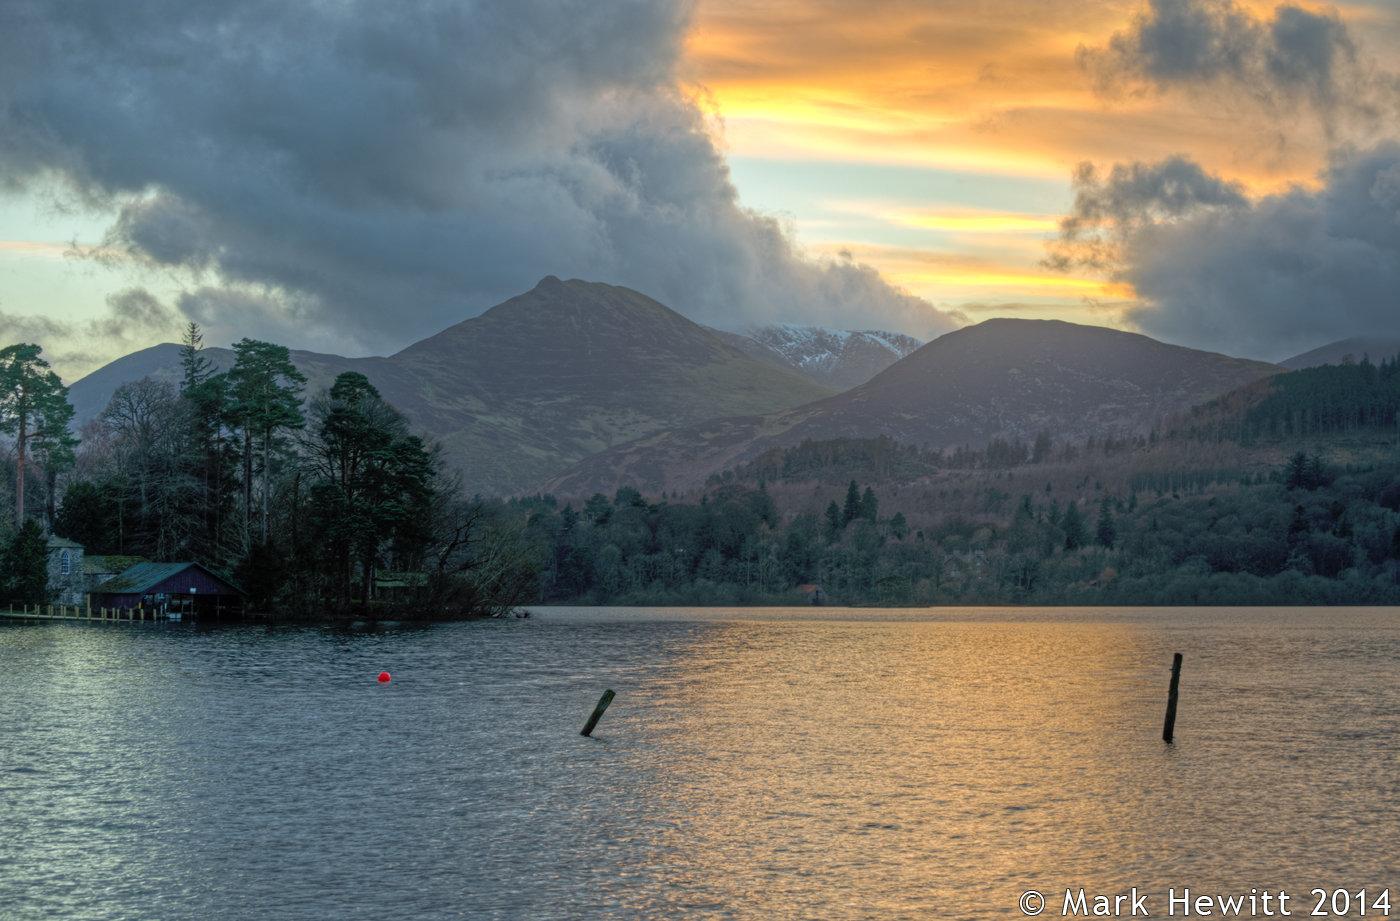 Sunset Over Causey Pike & Barrow Fell